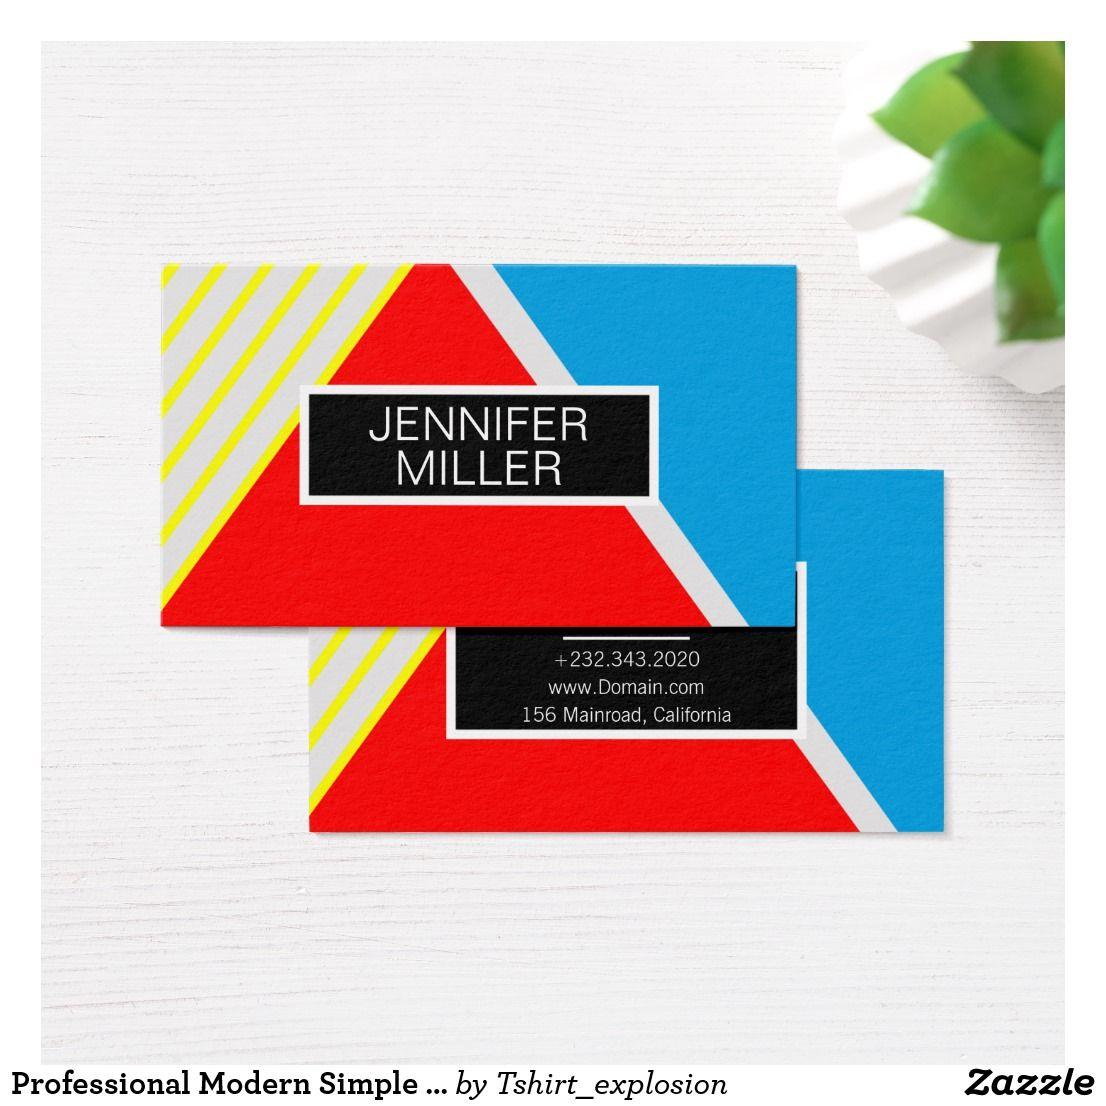 Professional Modern Simple Popular Stylish Business Card